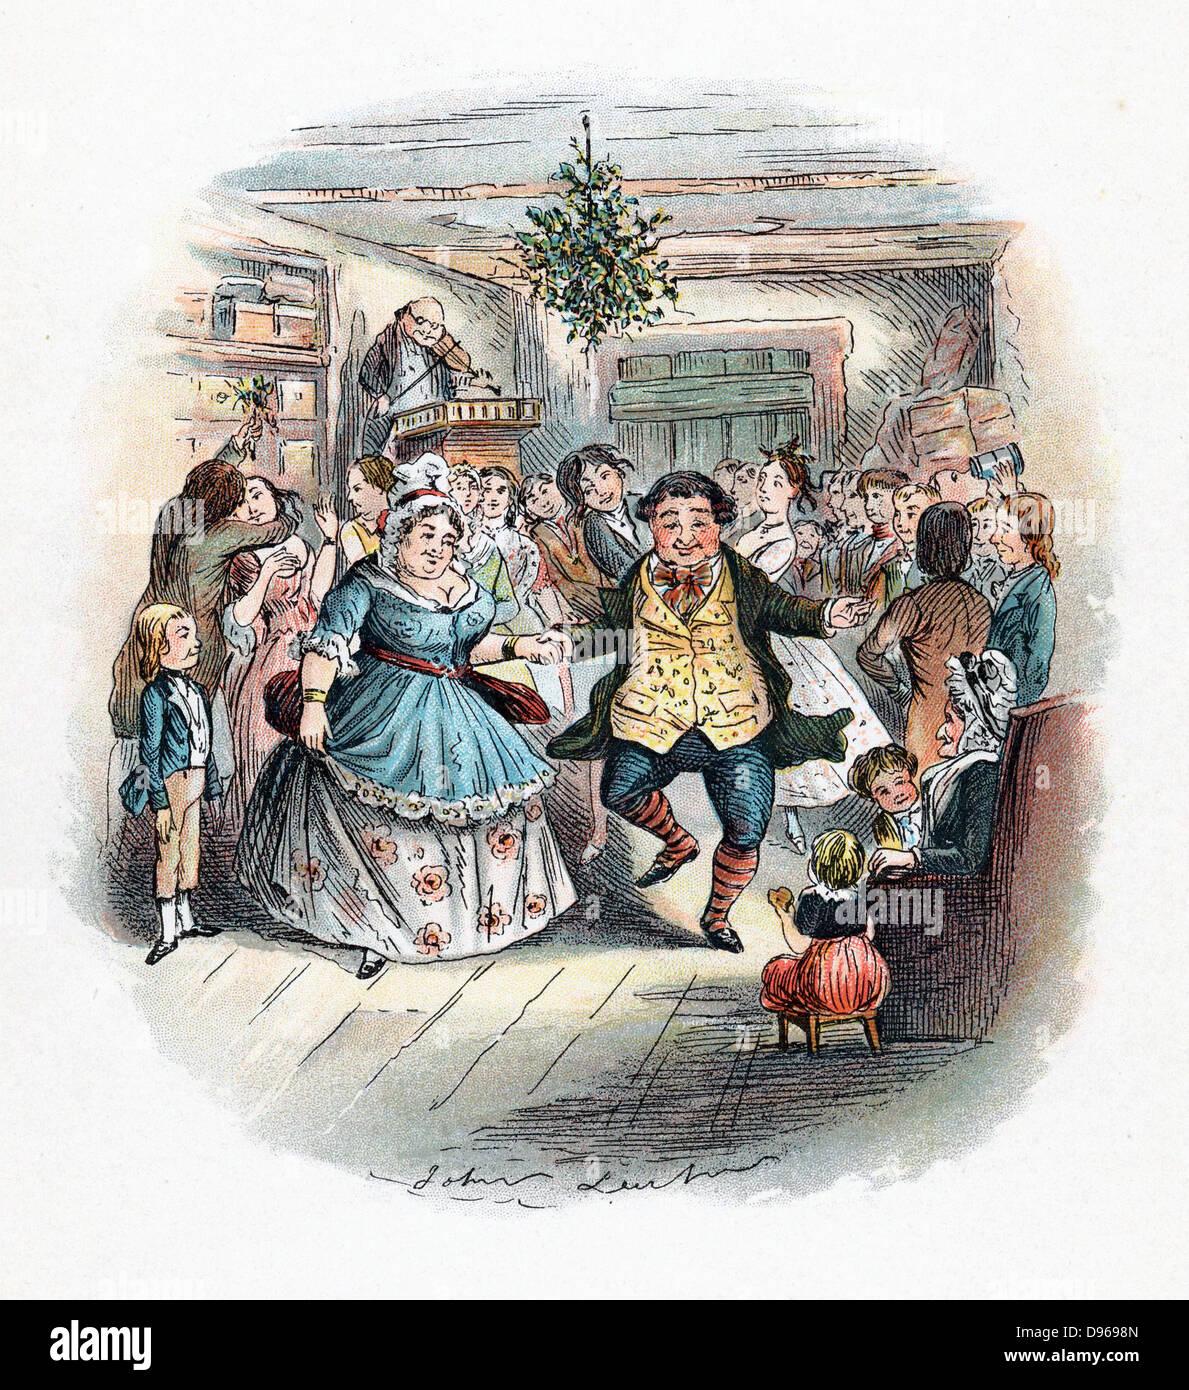 "Señor Fezziwig's Ball, ilustración por John Leech para ""Un Cuento de Navidad"" de Charles Imagen De Stock"